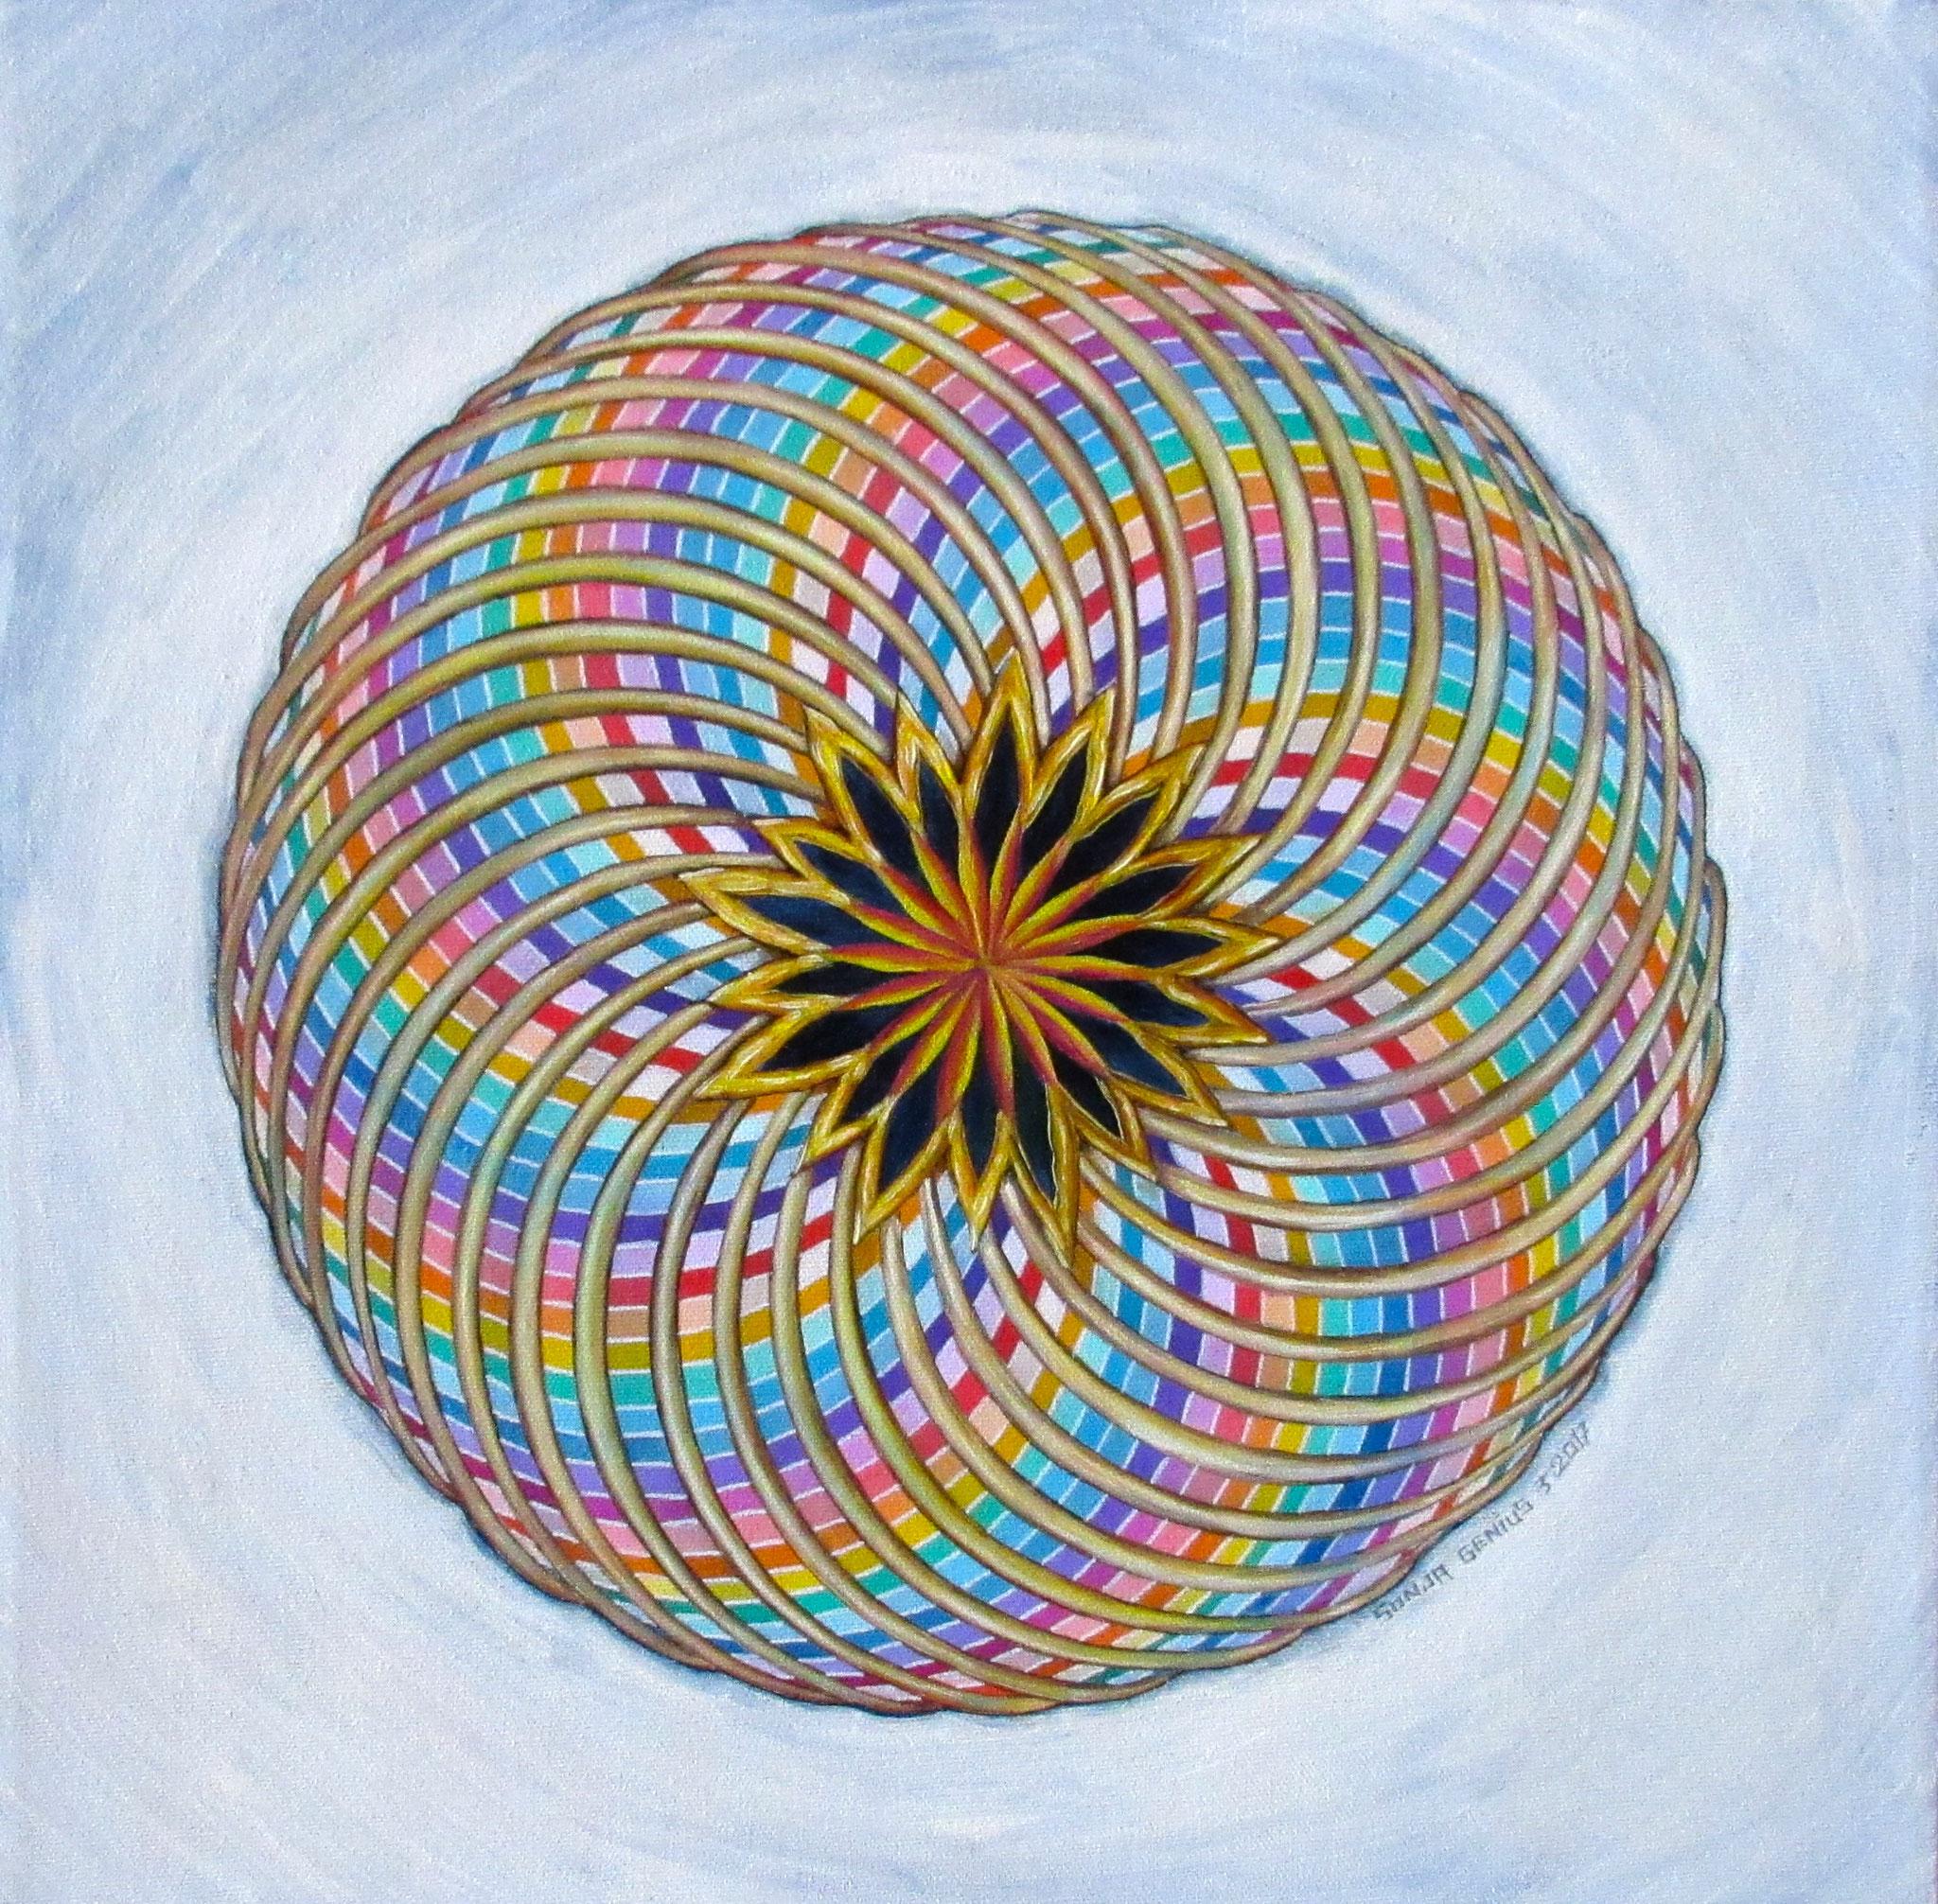 "#434 - ""Rainbow Torus"", oil on canvas 16x16, March 2017 (4)"